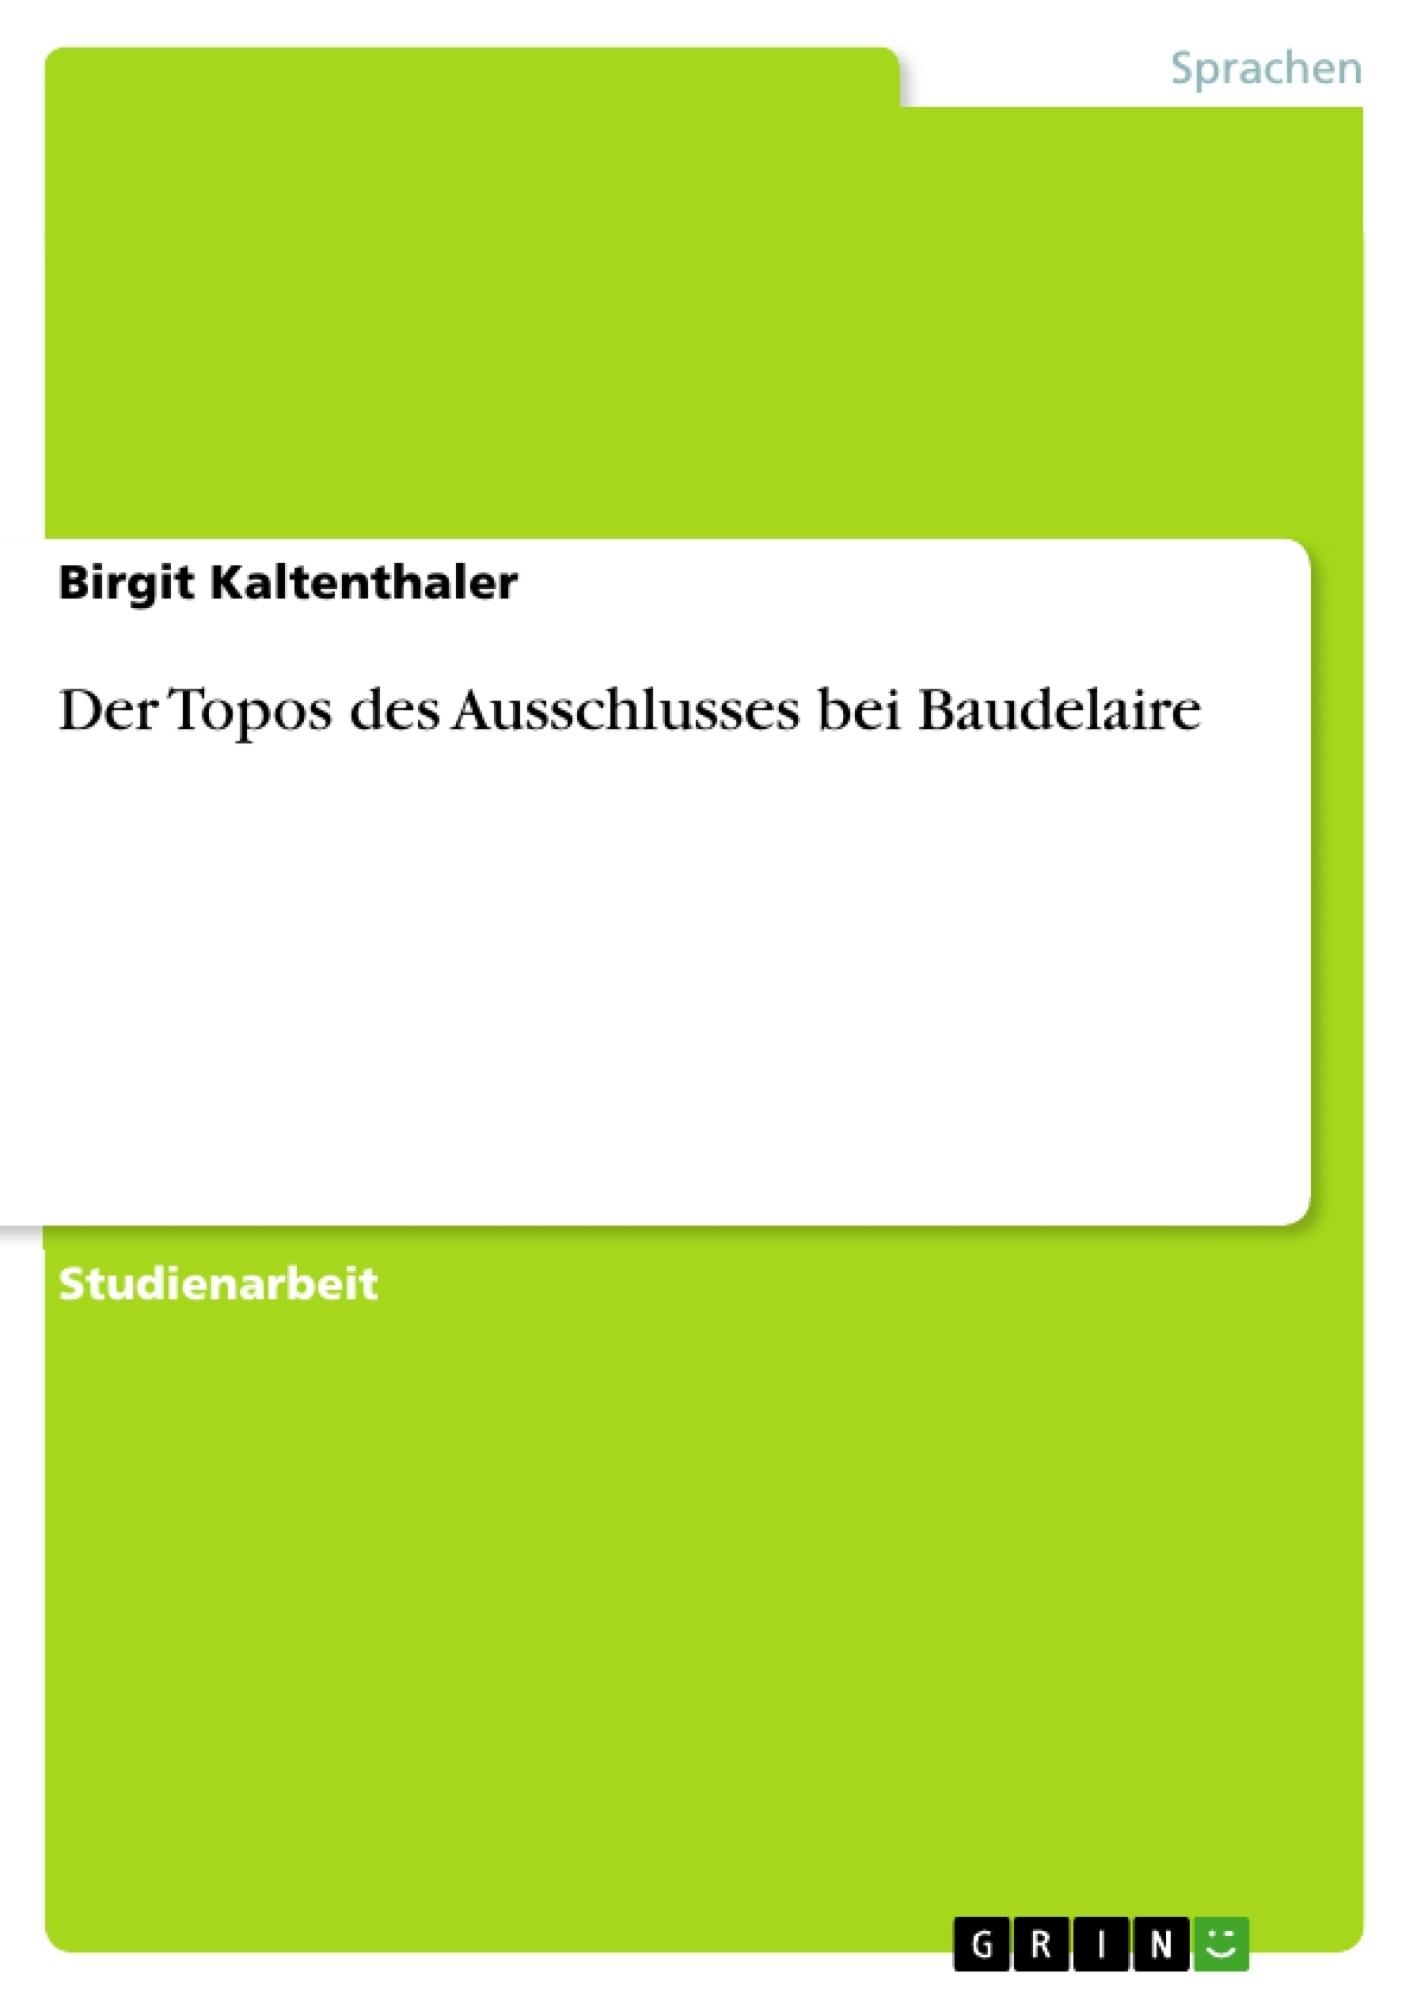 Titel: Der Topos des Ausschlusses bei Baudelaire